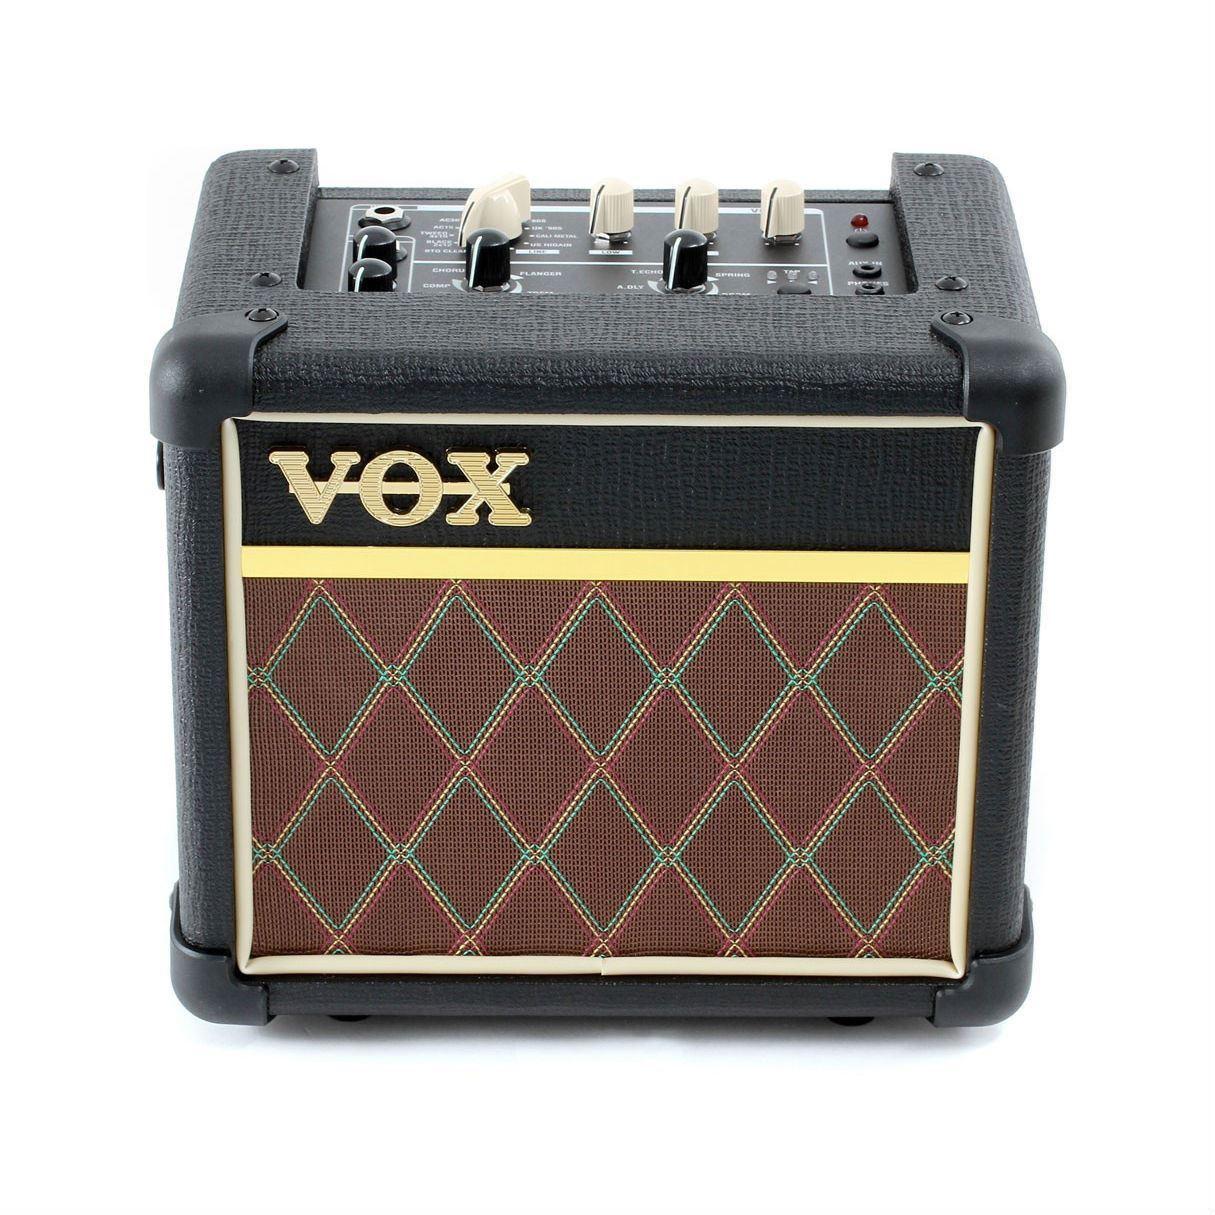 vox vt40x dlp music and repair. Black Bedroom Furniture Sets. Home Design Ideas